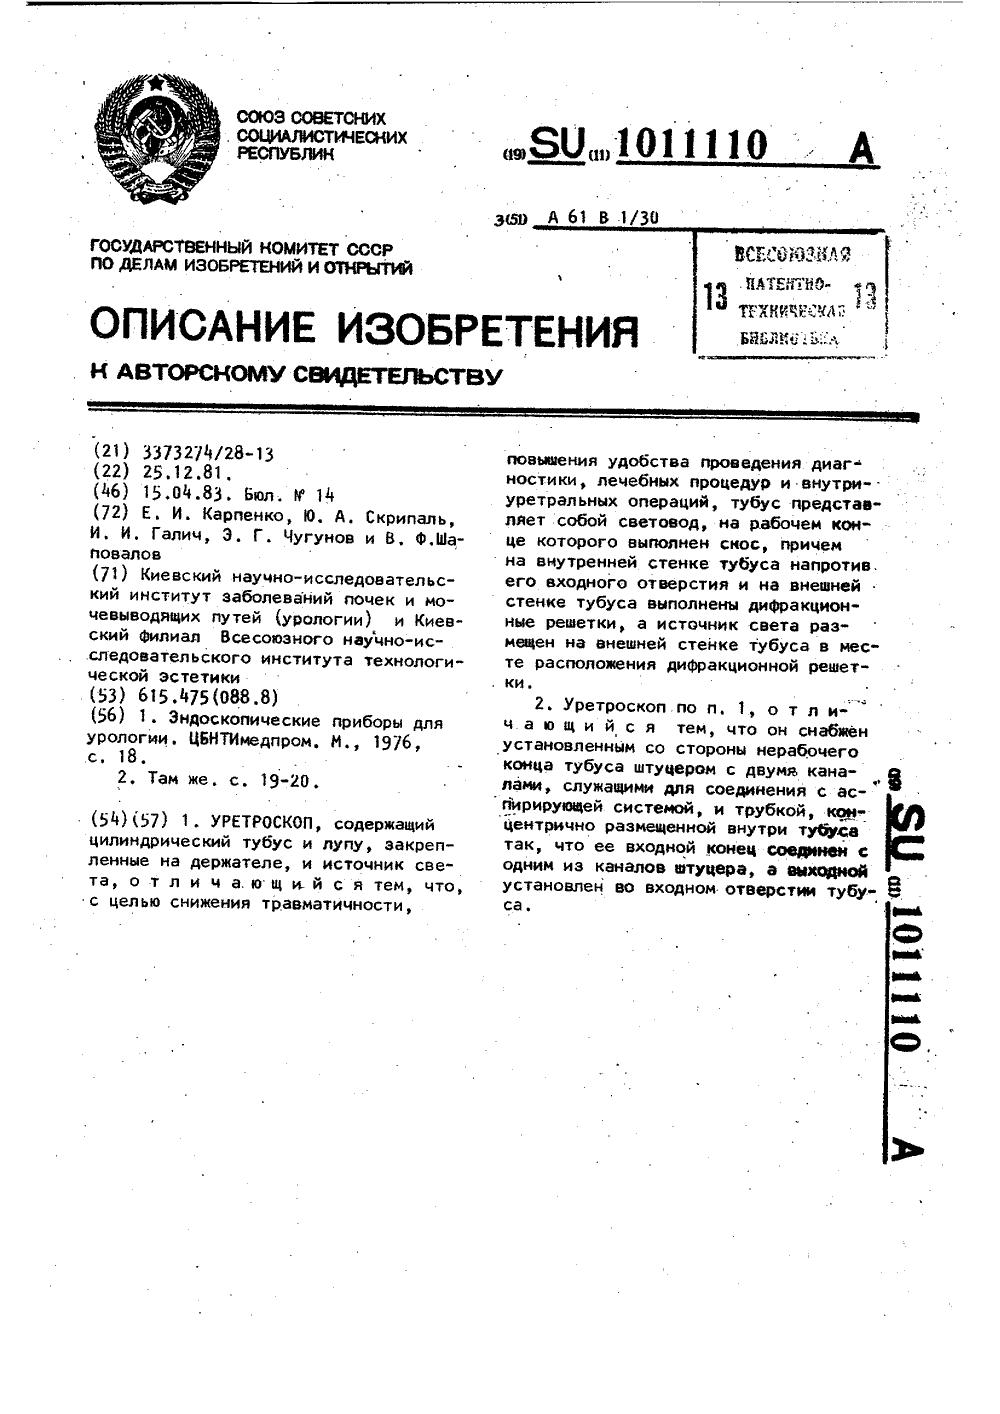 Уретроскоп фото